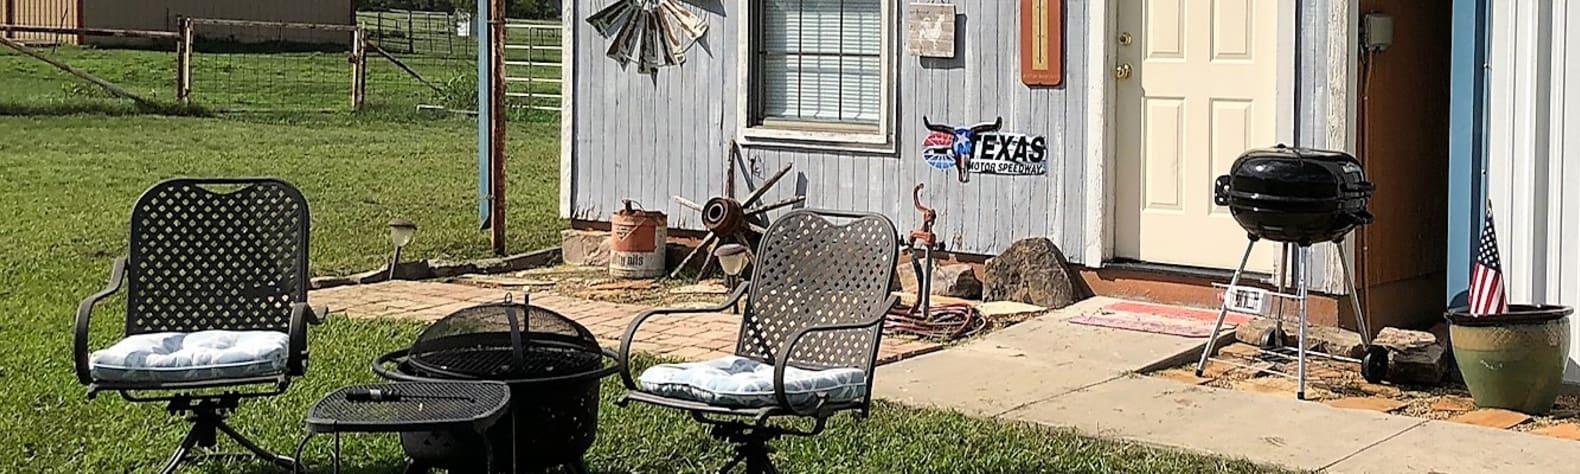 Texas Lazy J Ranch